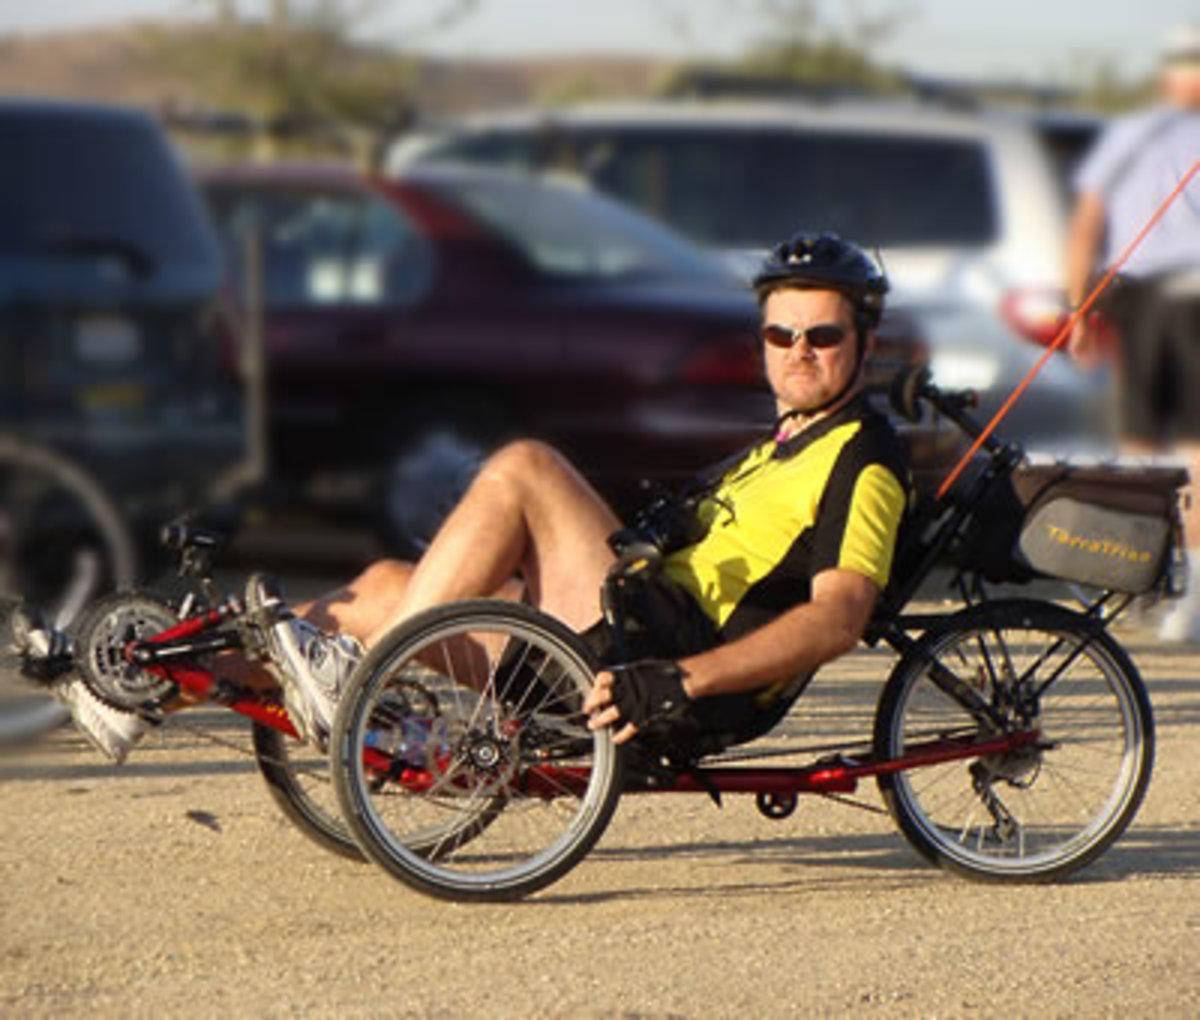 Recumbent Trike - My Midlife Crisis Car